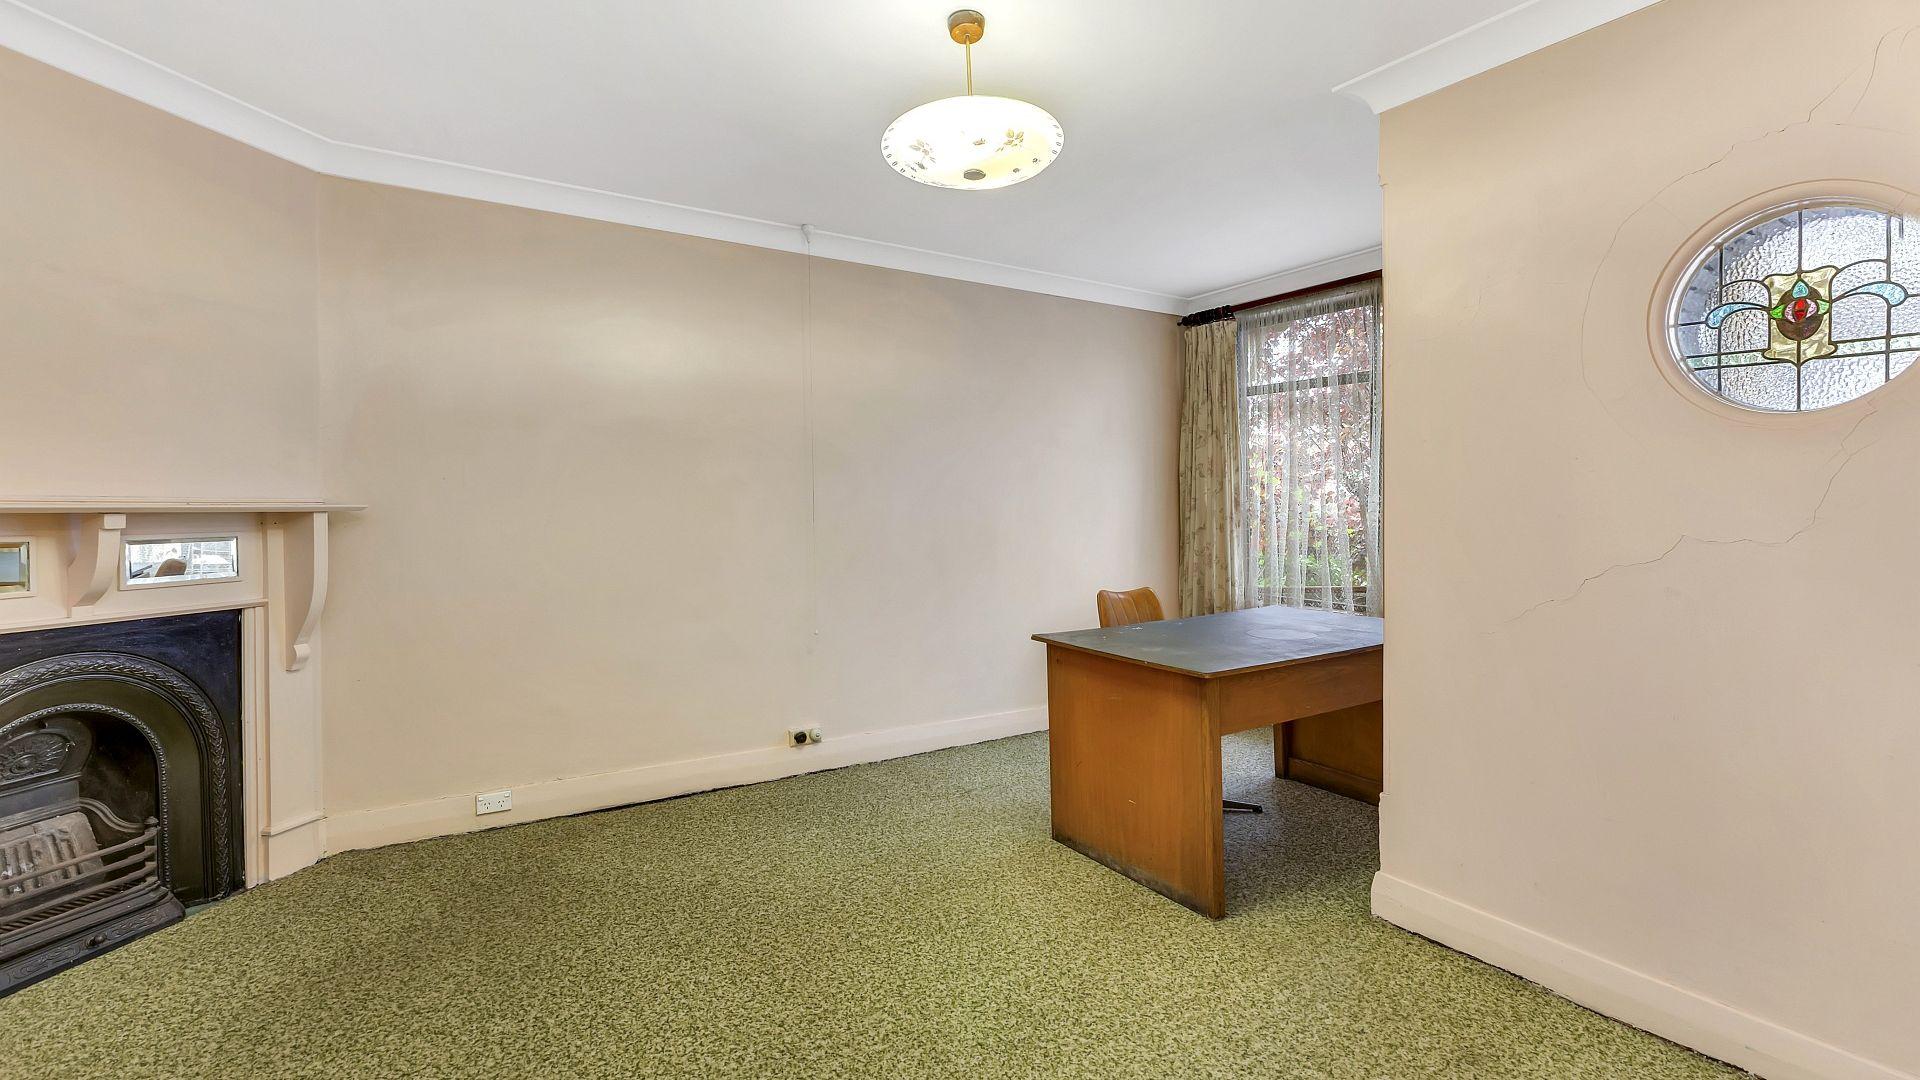 17-19 Calero Street, Lithgow NSW 2790, Image 2